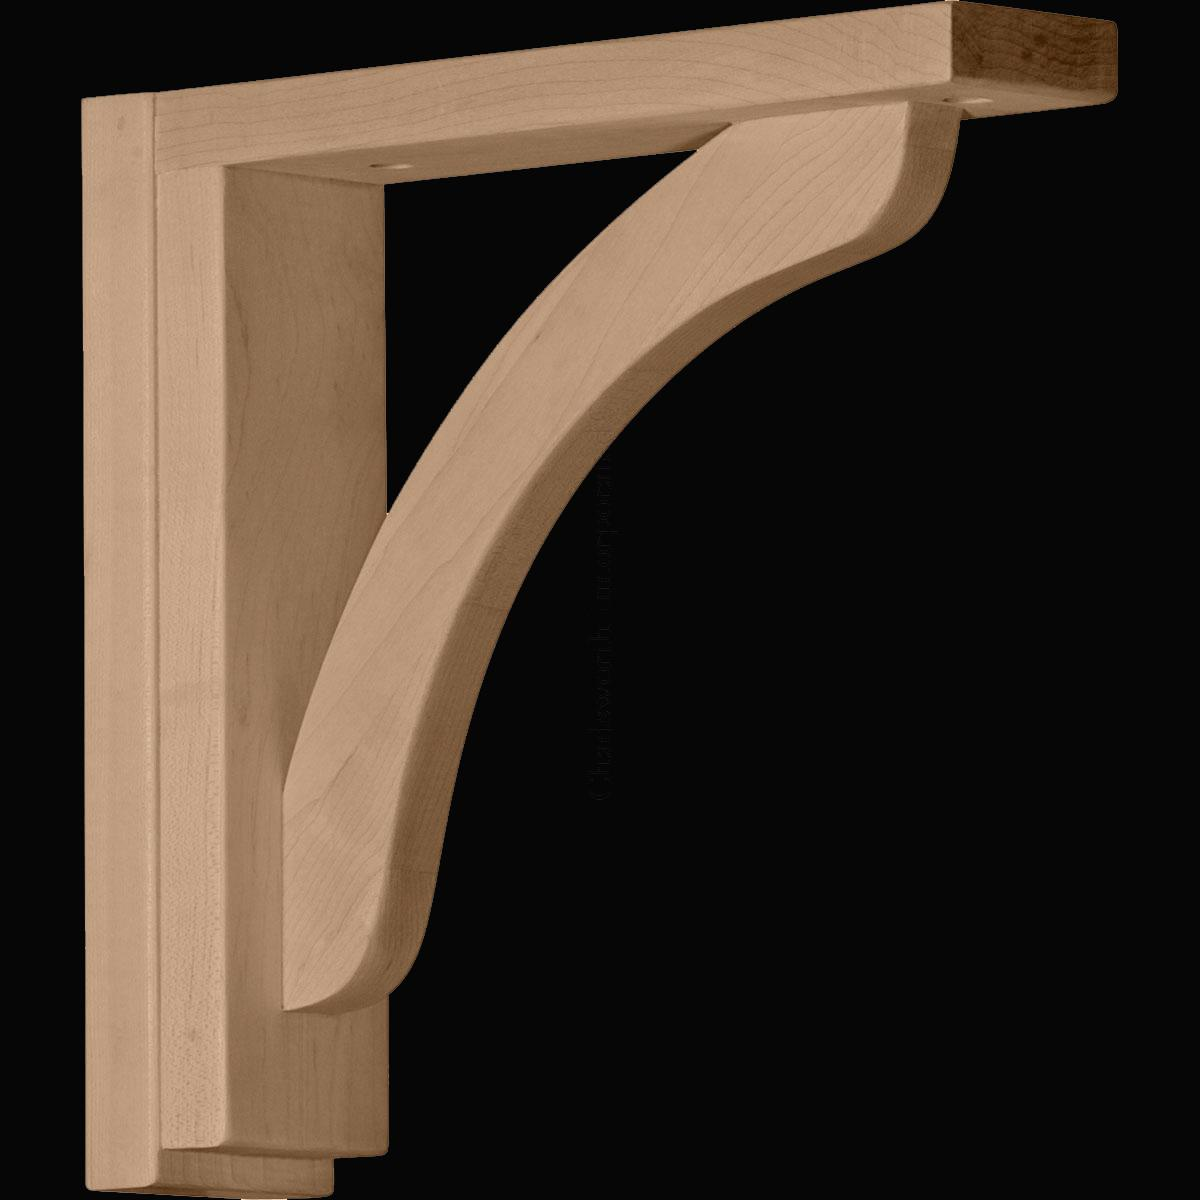 woodworking plans download wood shelf bracket plans free